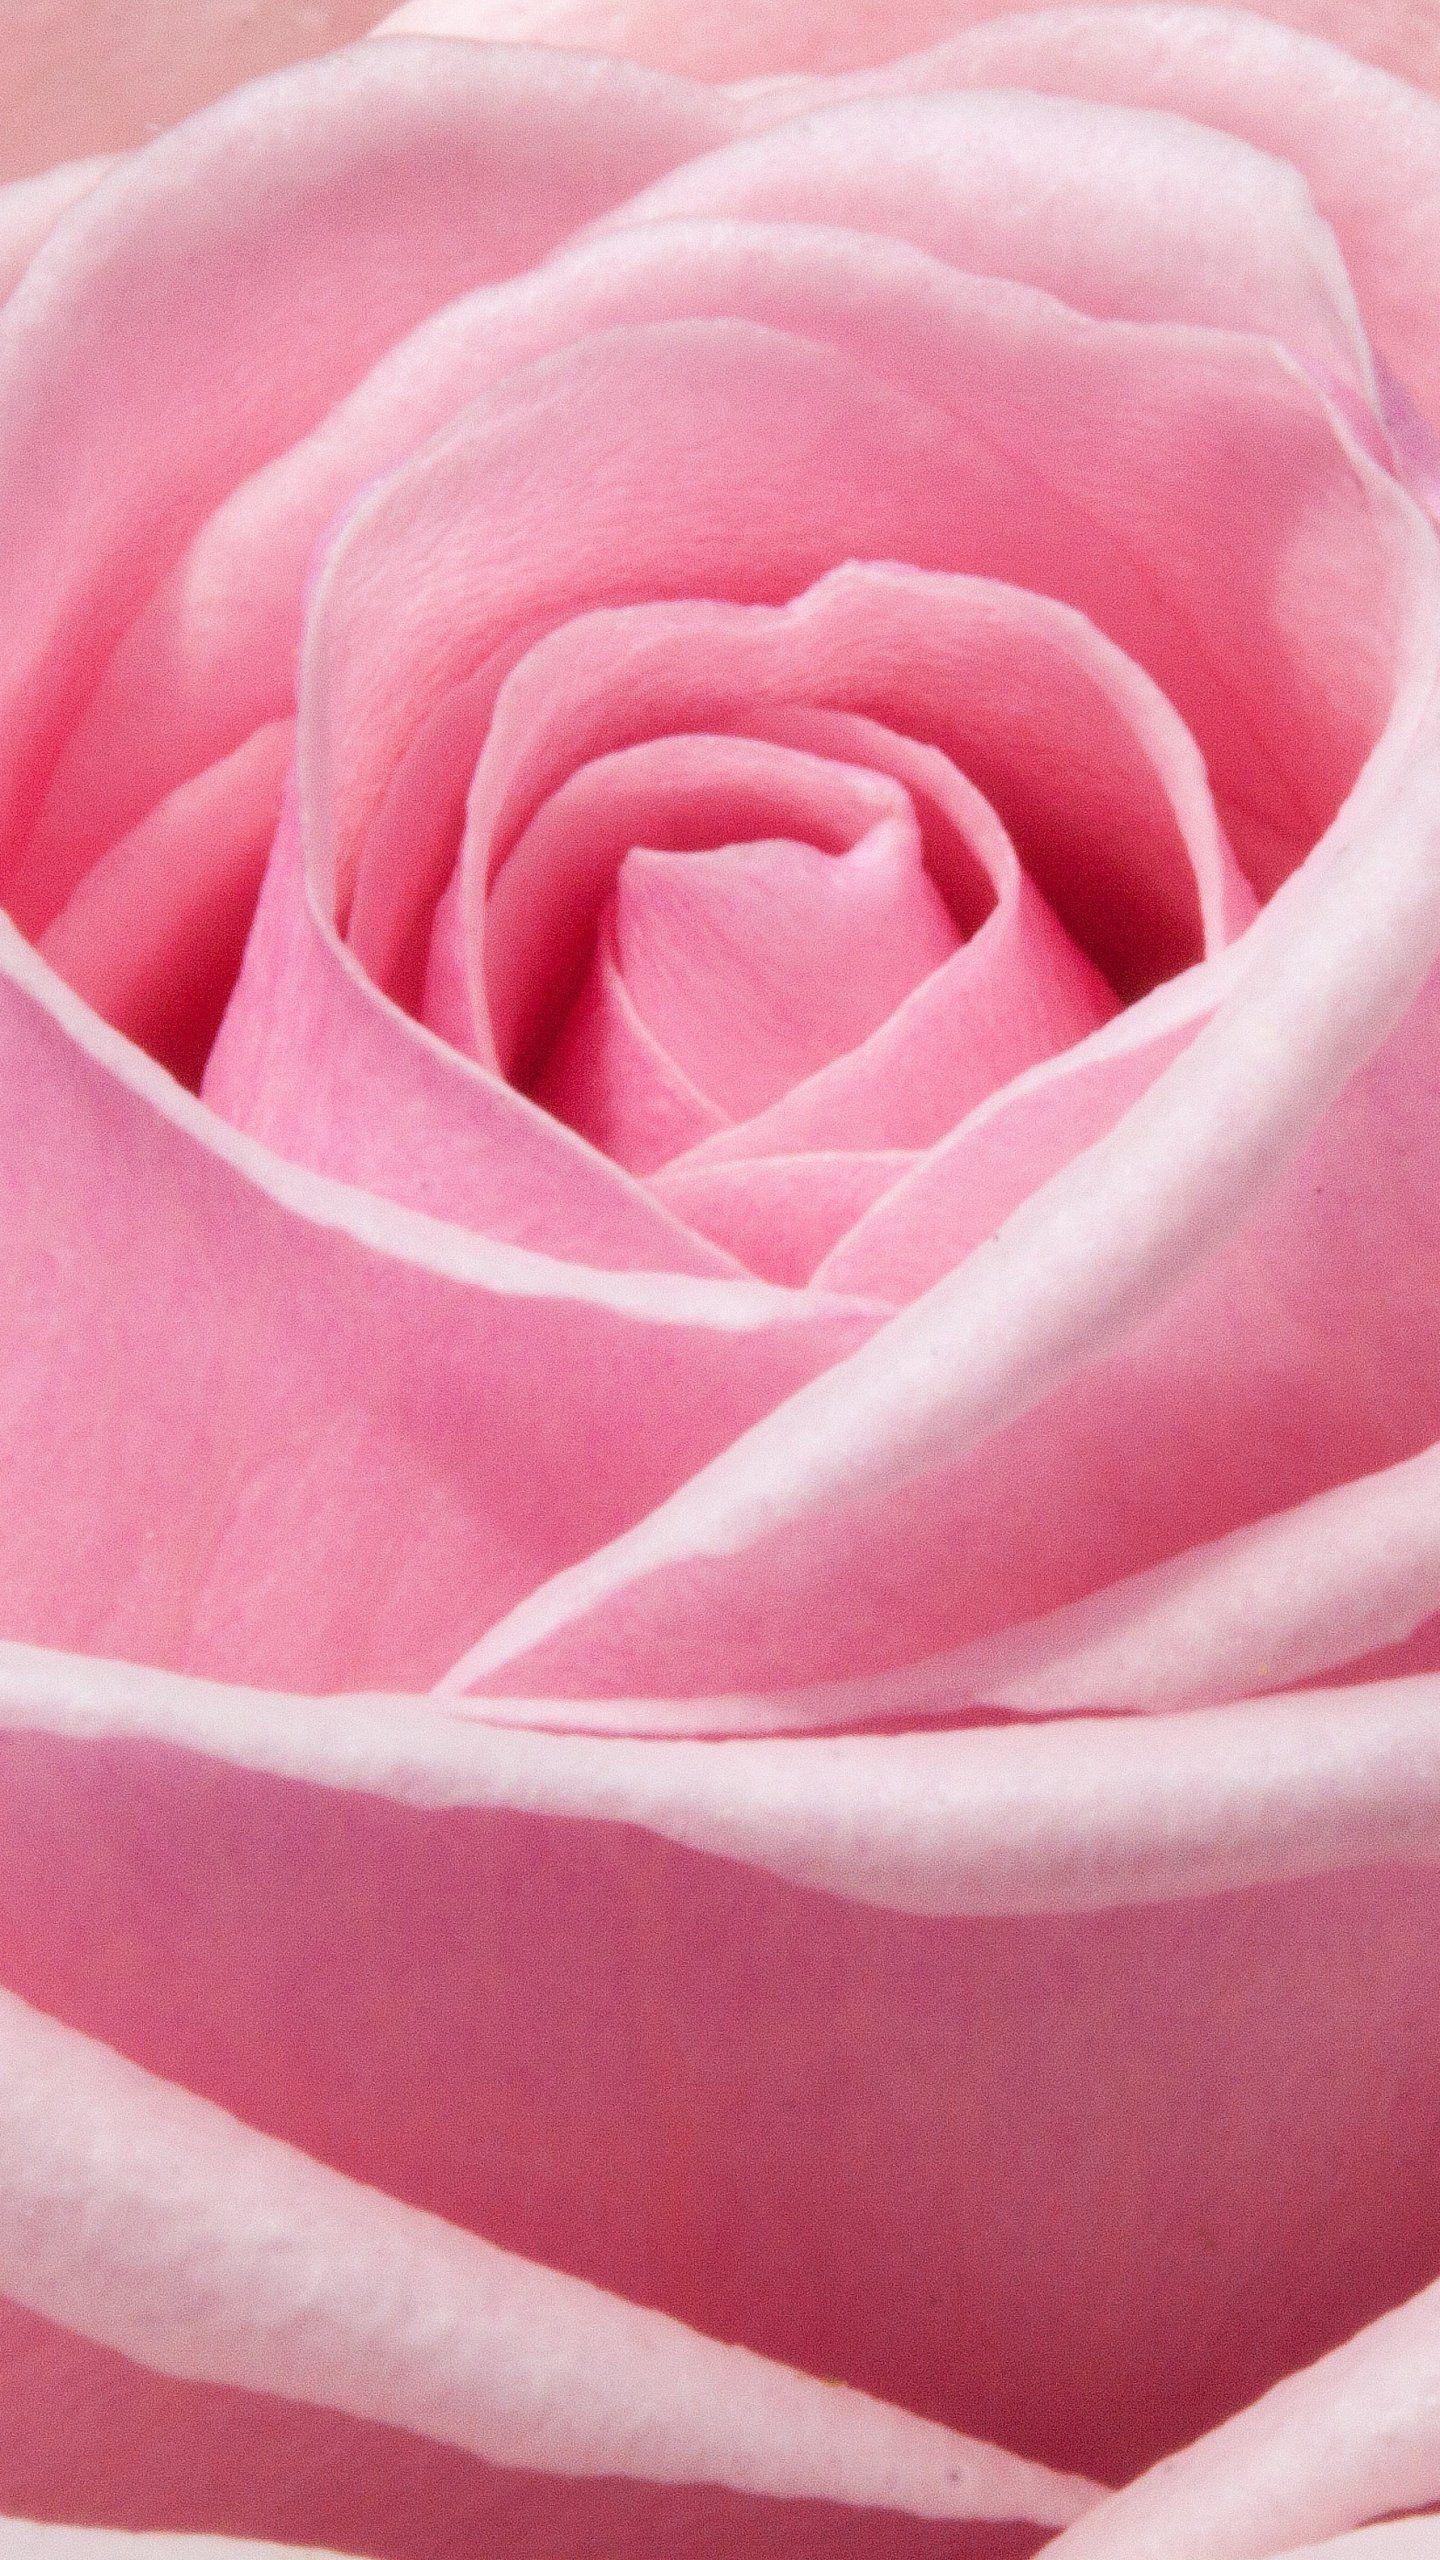 Pink Rose Wallpaper Iphone Android Desktop Backgrounds Pink Wallpaper Iphone Rose Wallpaper Pink Flowers Wallpaper